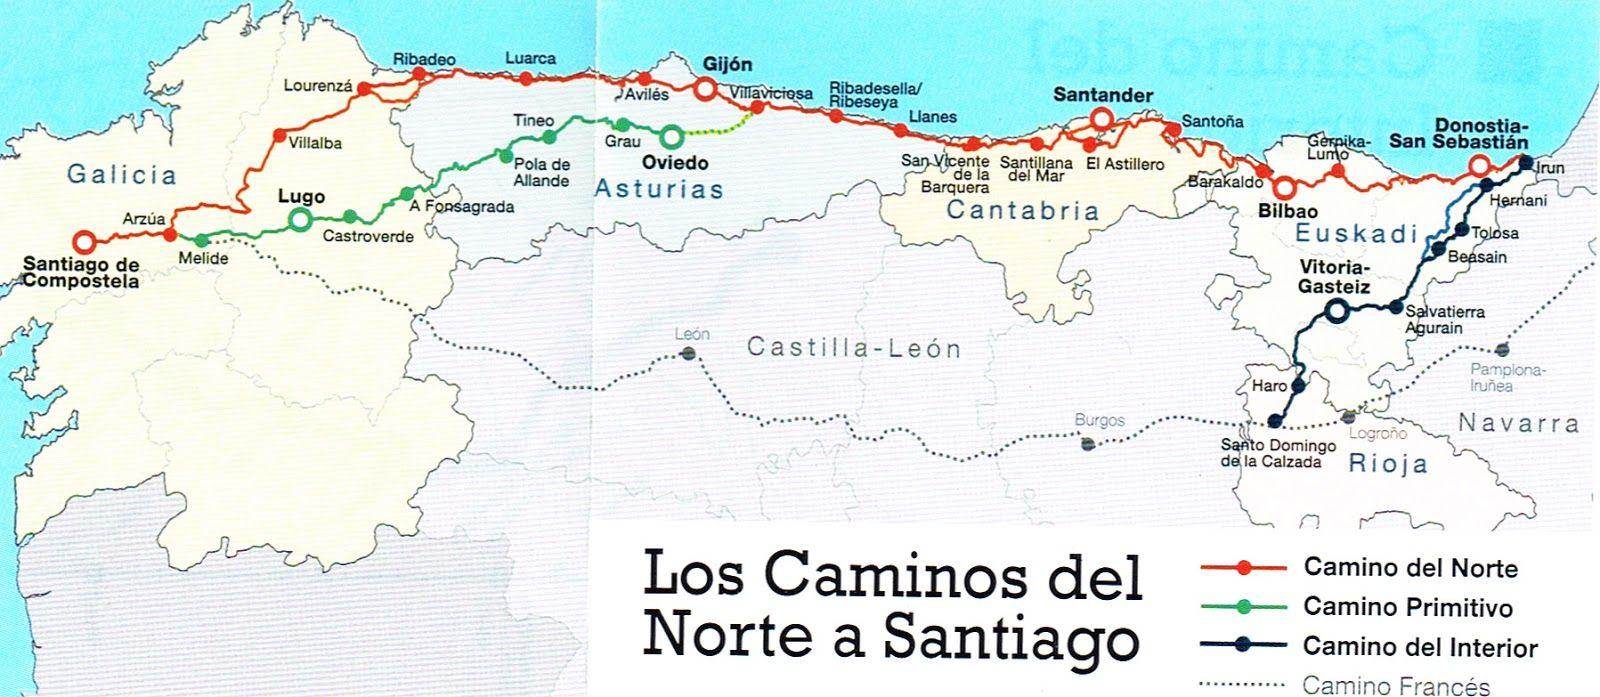 Camino Primitivo 1 Jpg 1600 697 Euskadi